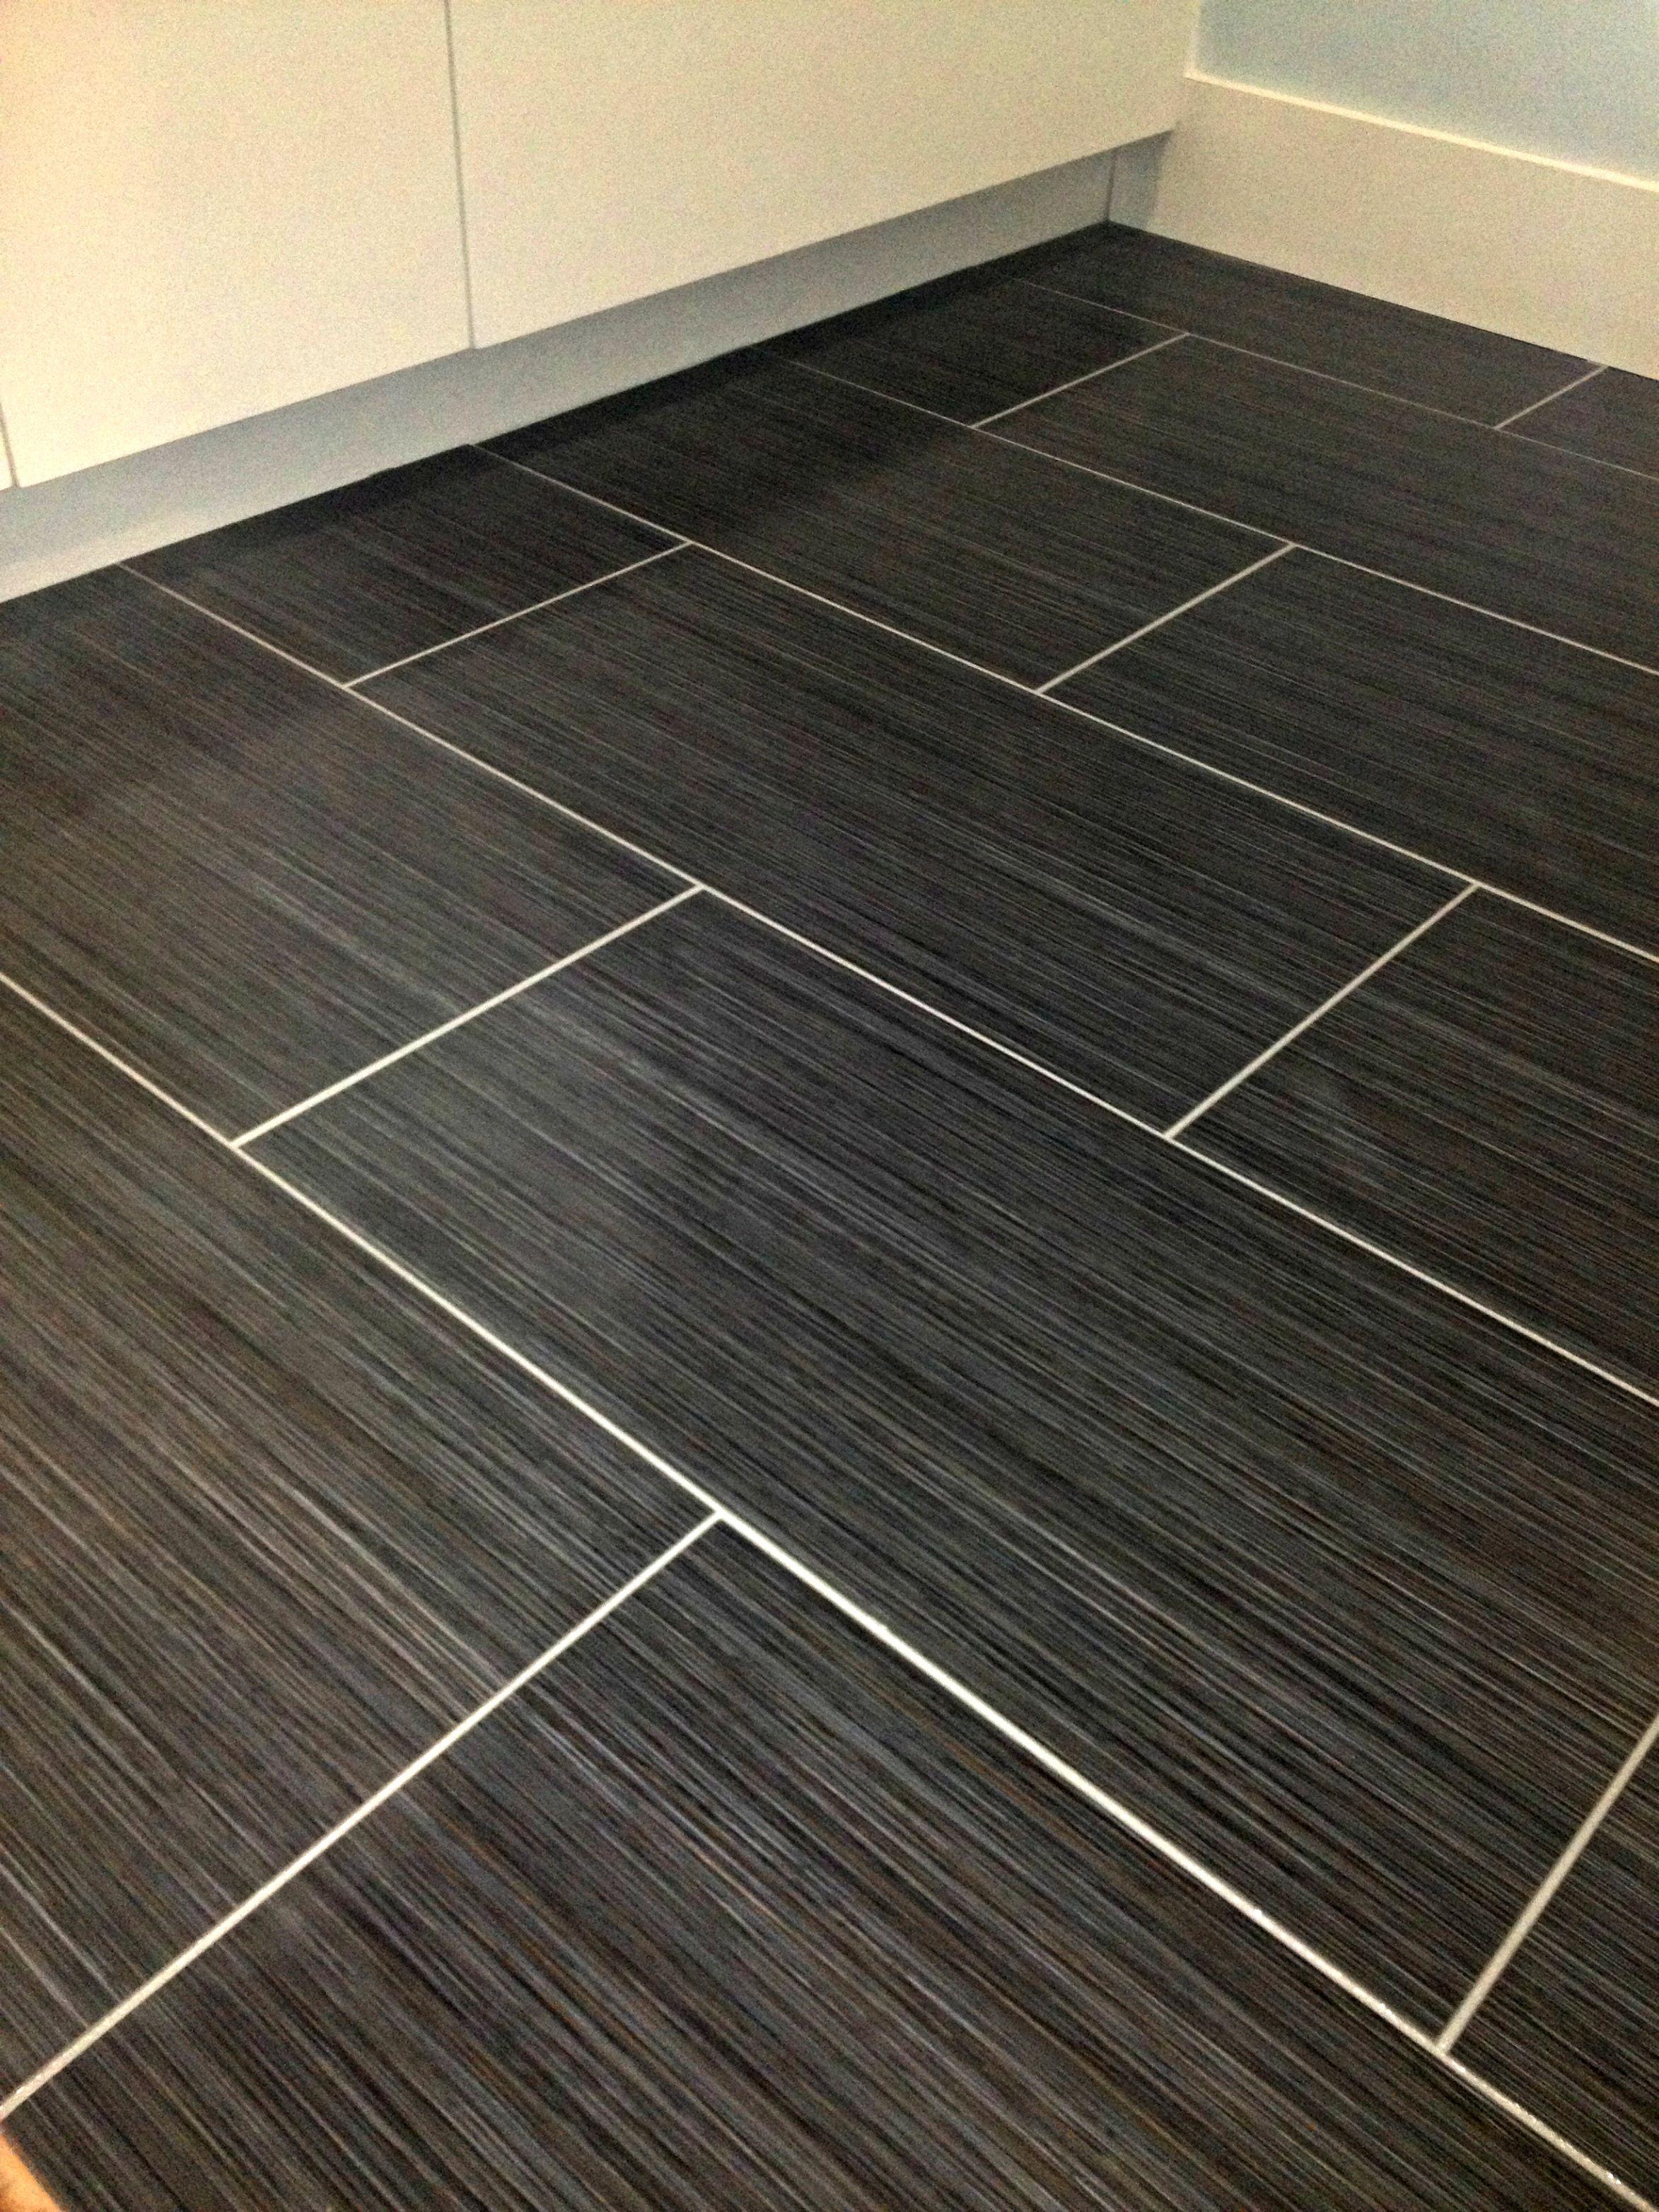 Floor With Dark Tile And Light Grout Tiles Dark Tile Flooring